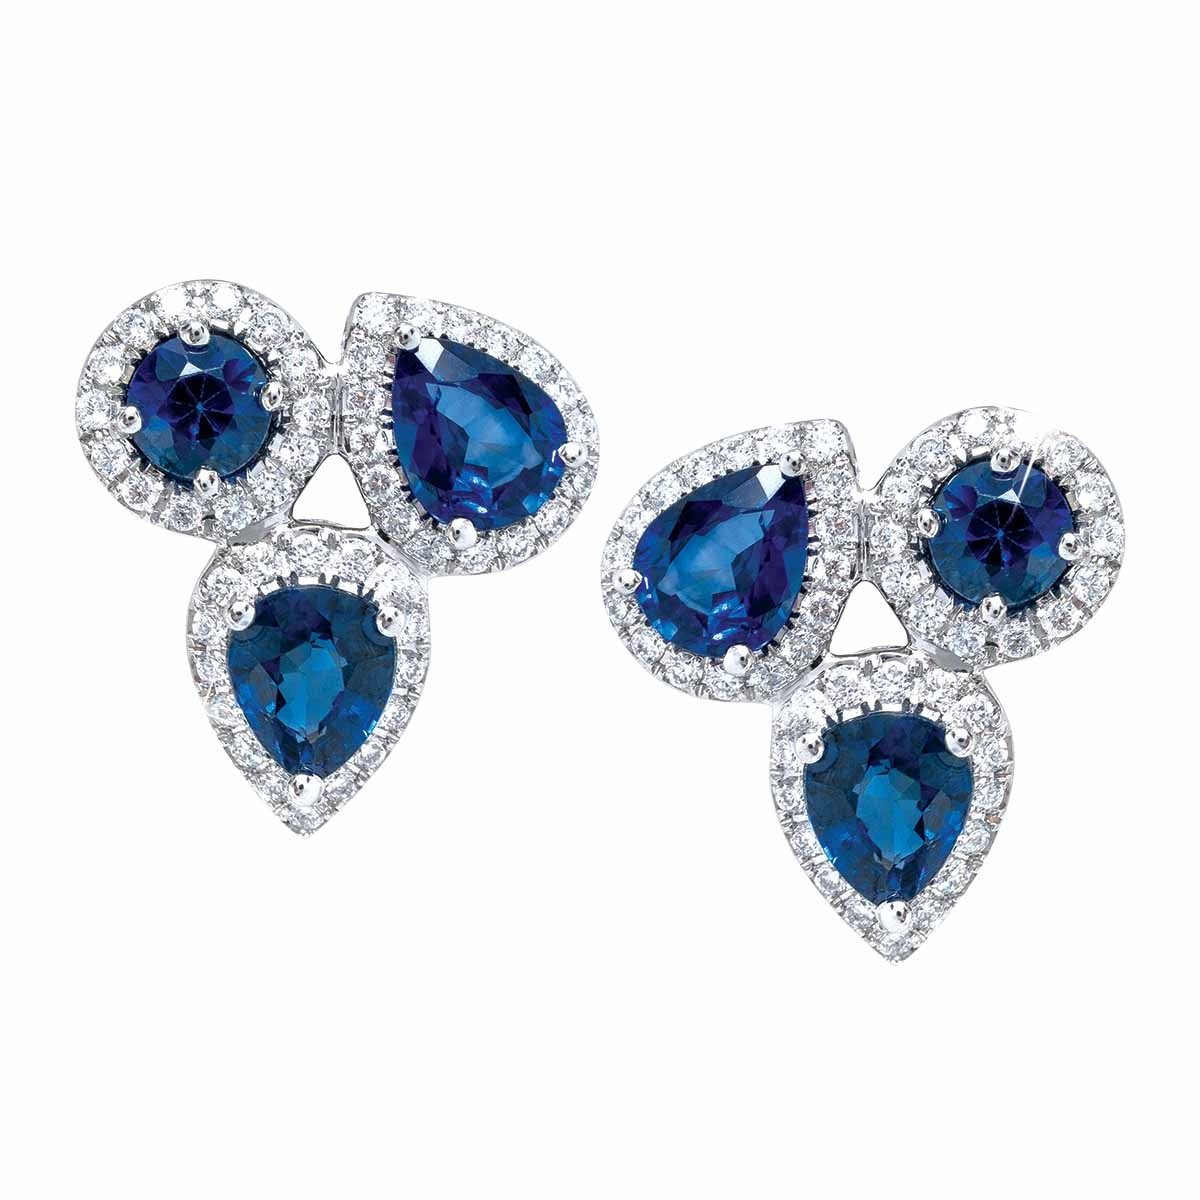 New Asba & Dangler 2.45 CTW Blue Sapphire & Diamond Halo Stud Earrings